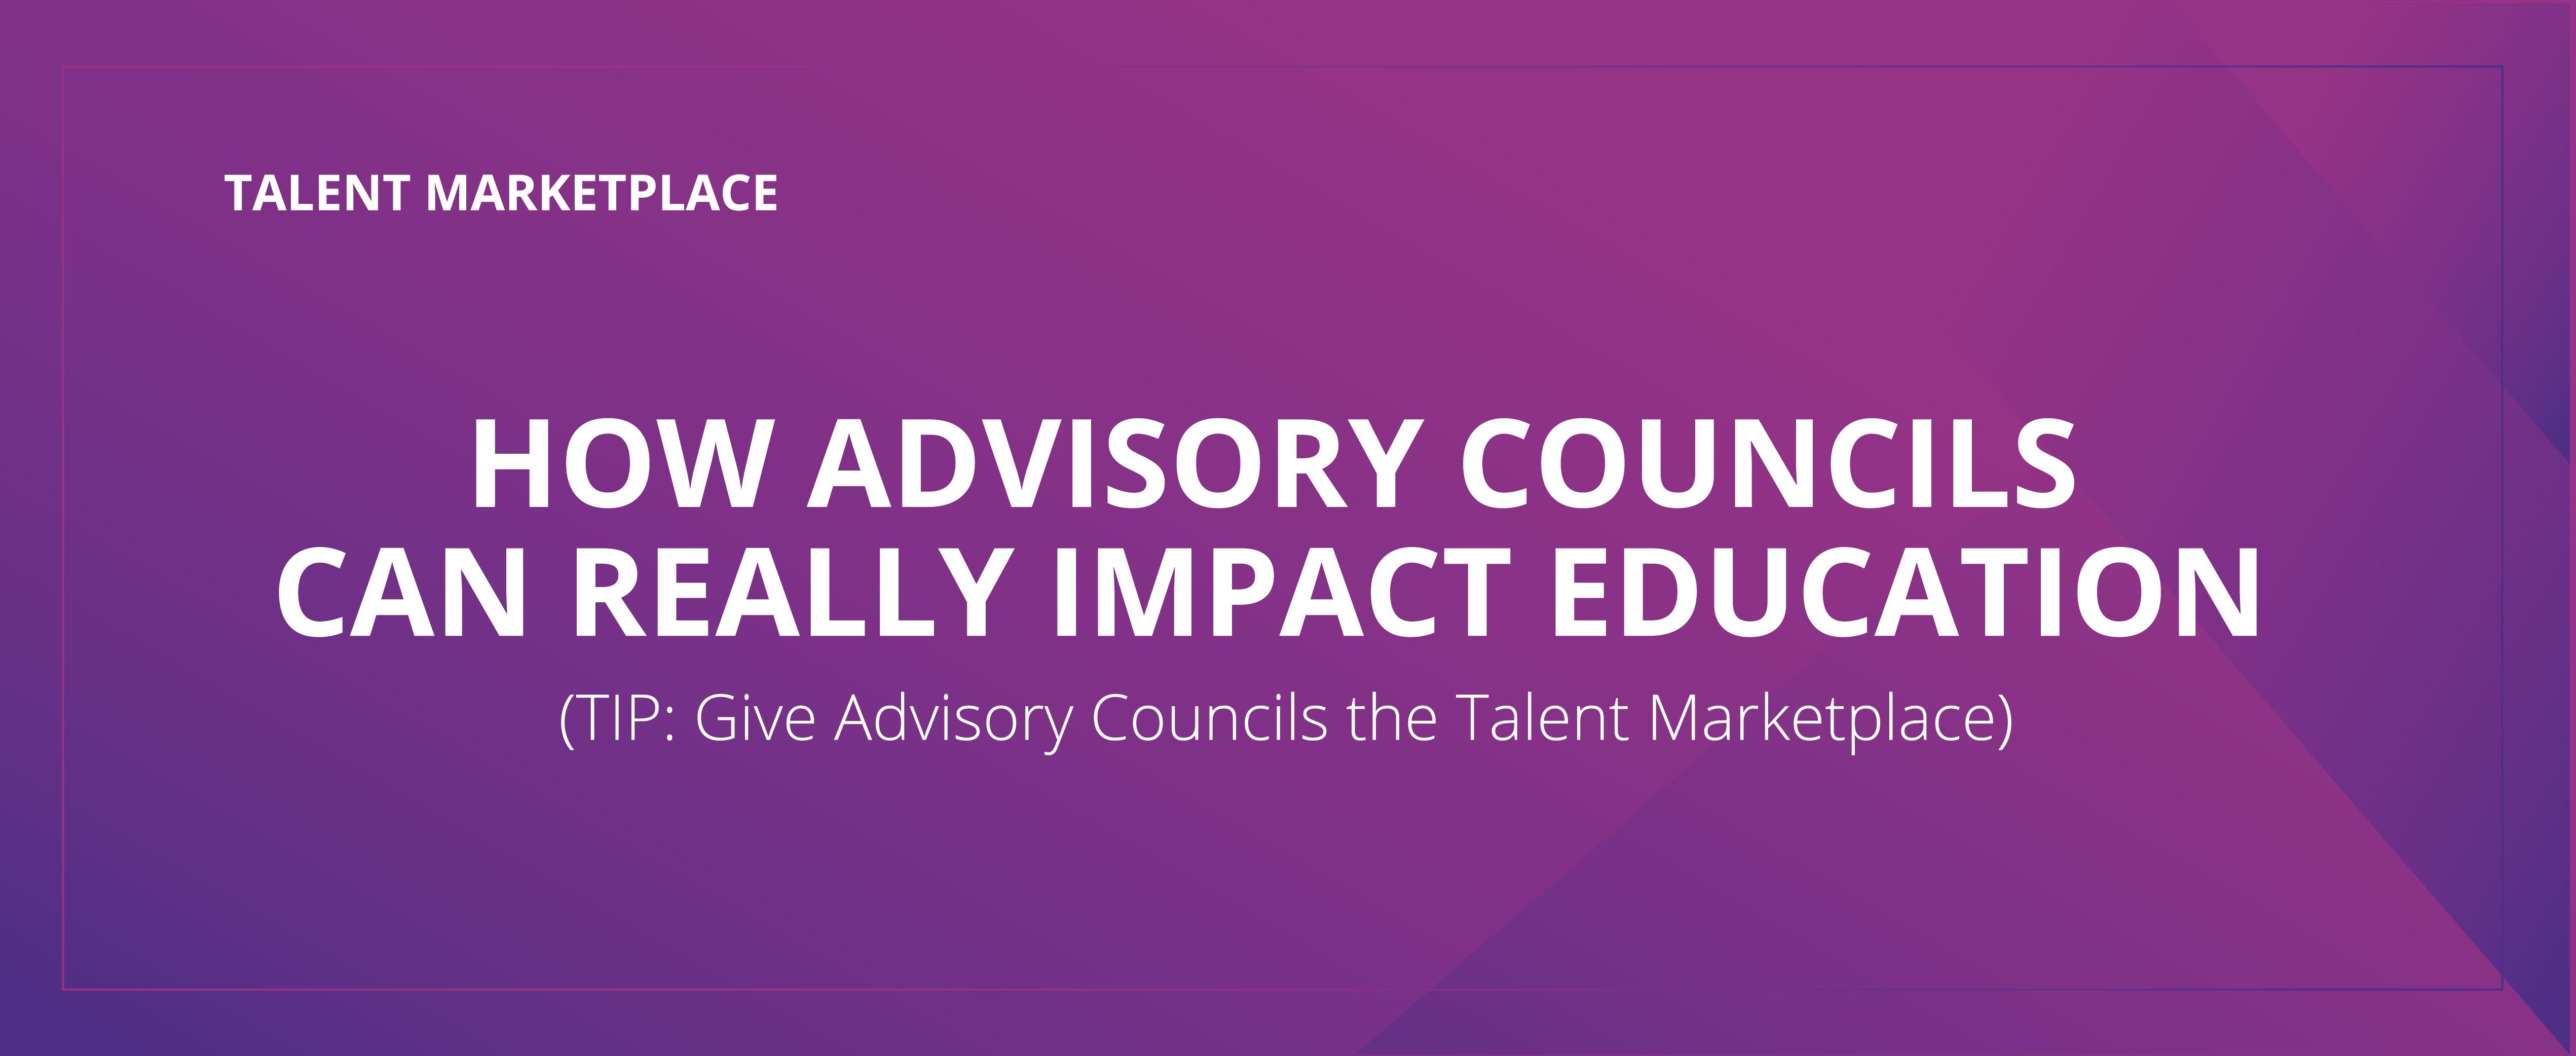 How Advisory Councils Impact Education